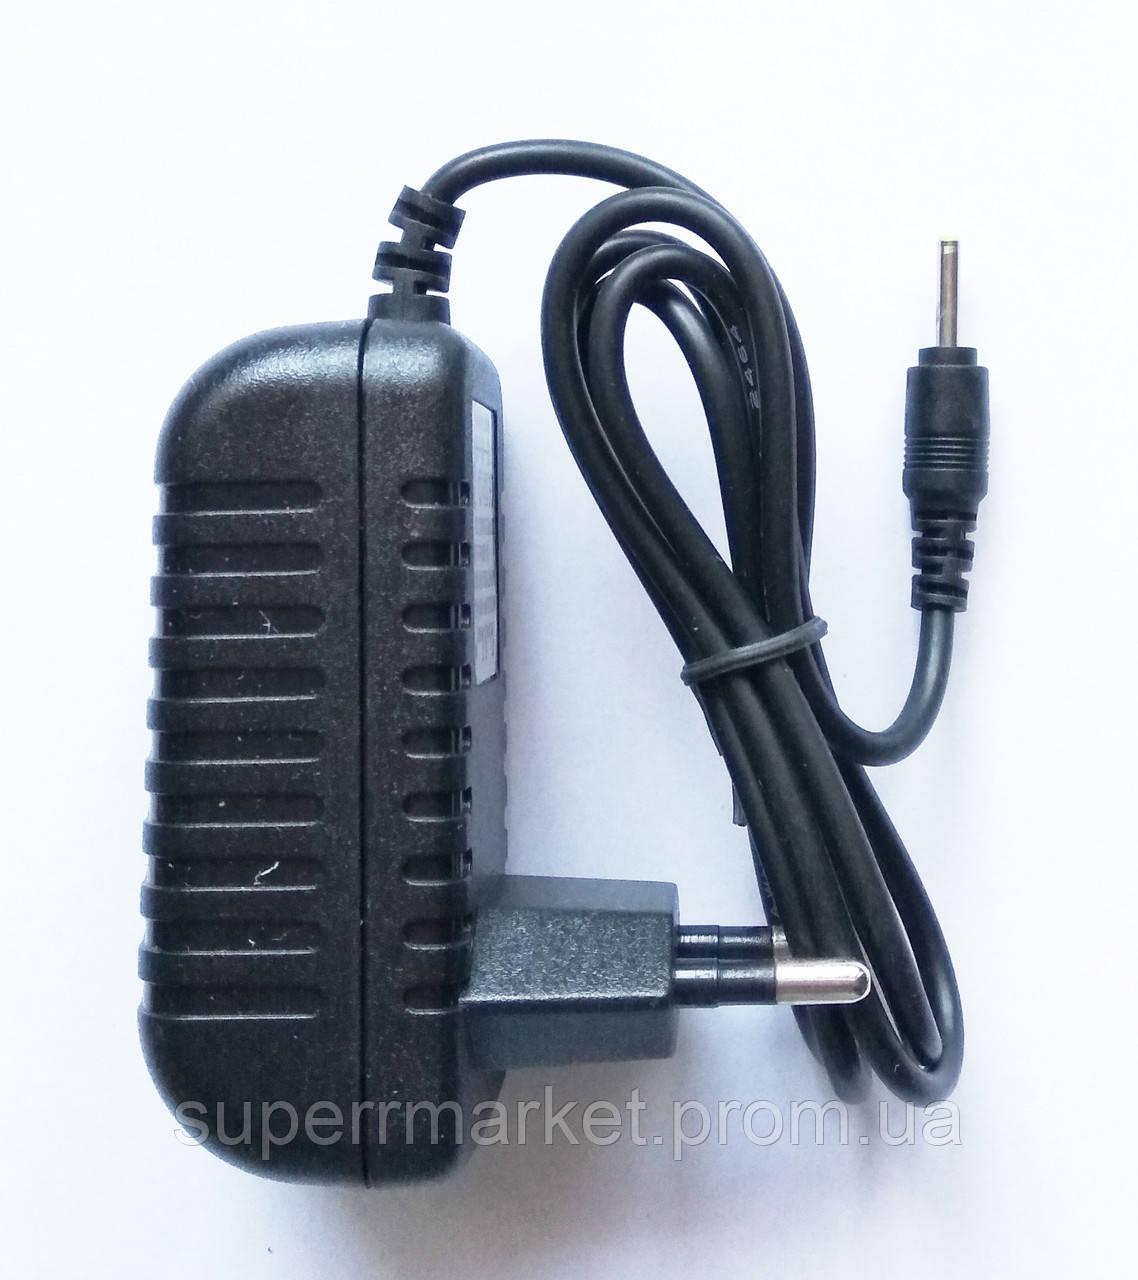 Блок питания 5V 3A WF-3000 адаптер зарядка для планшета AC DC, 2.5×0.7мм  MID